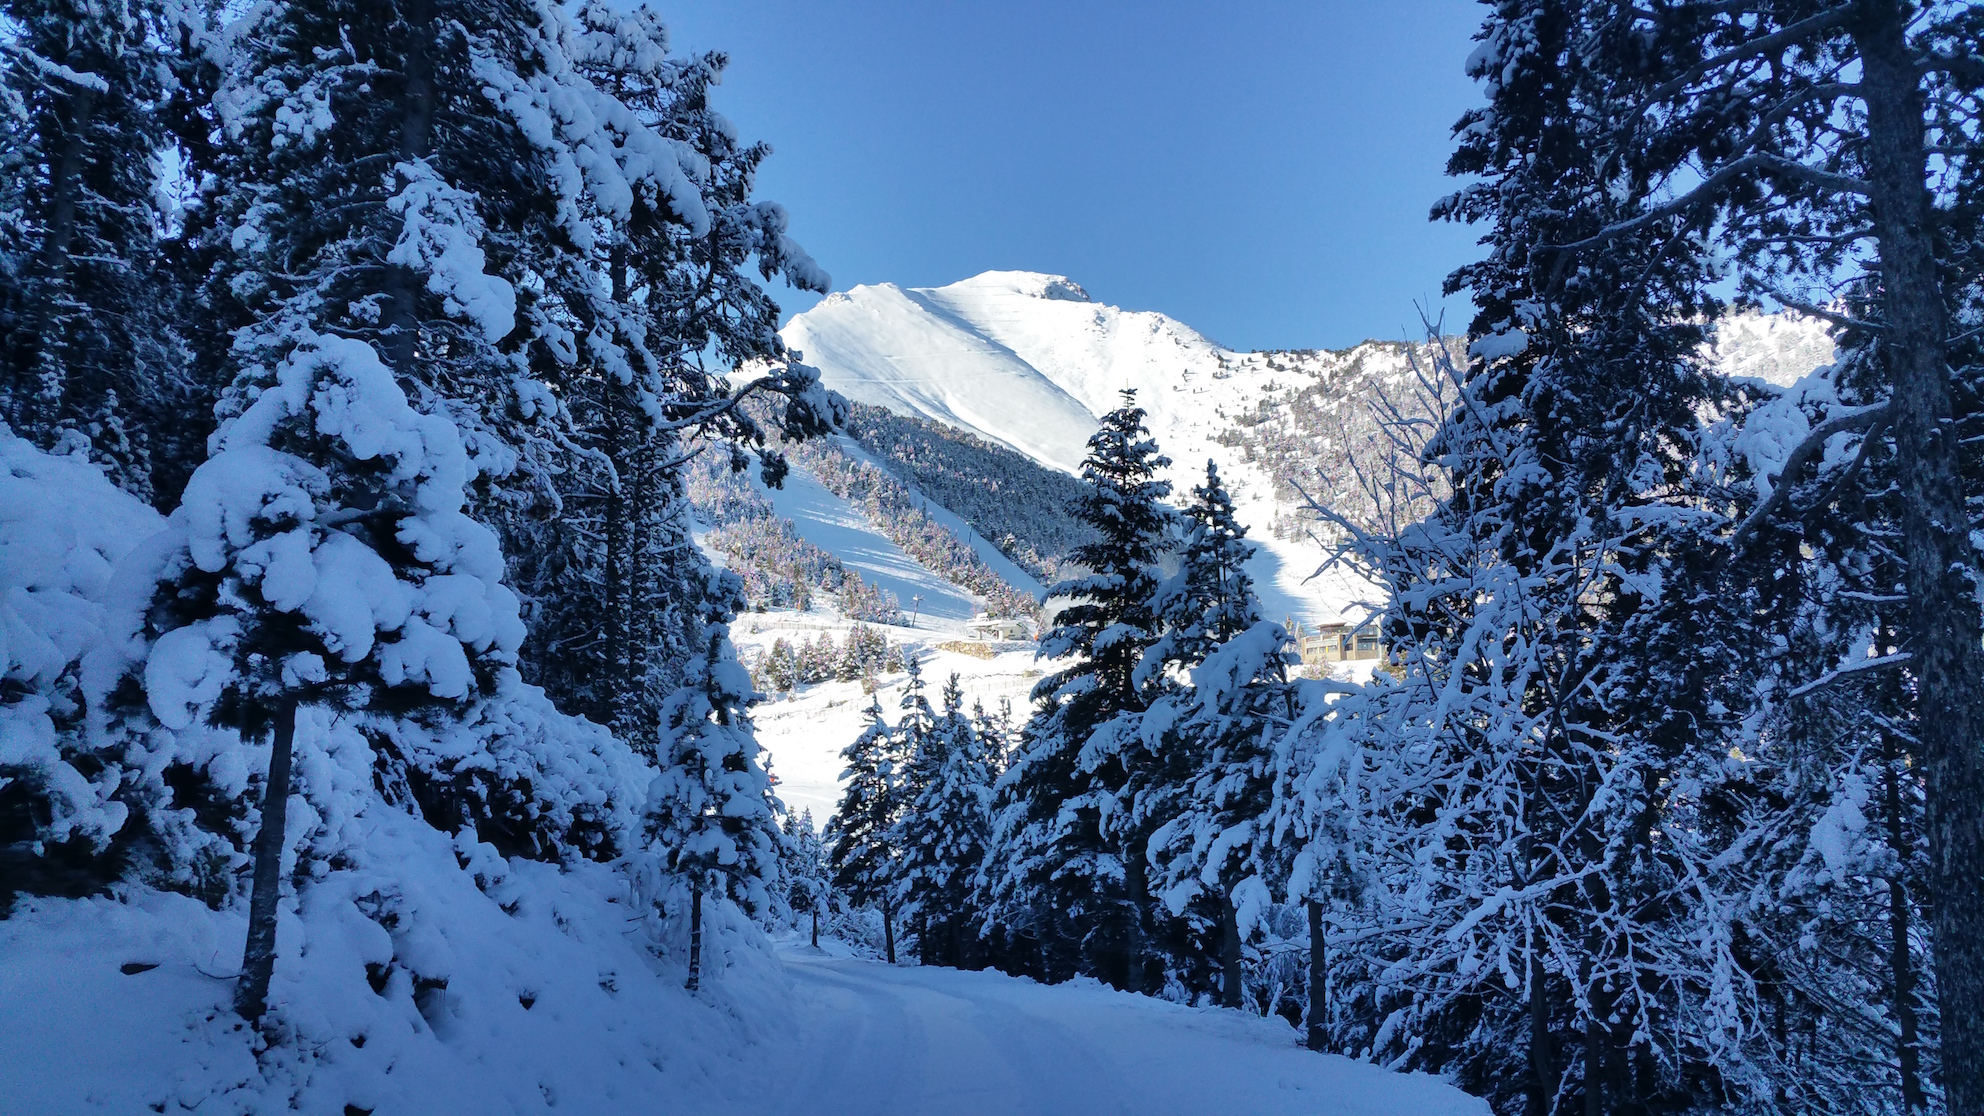 Pallars Sostenibilitat